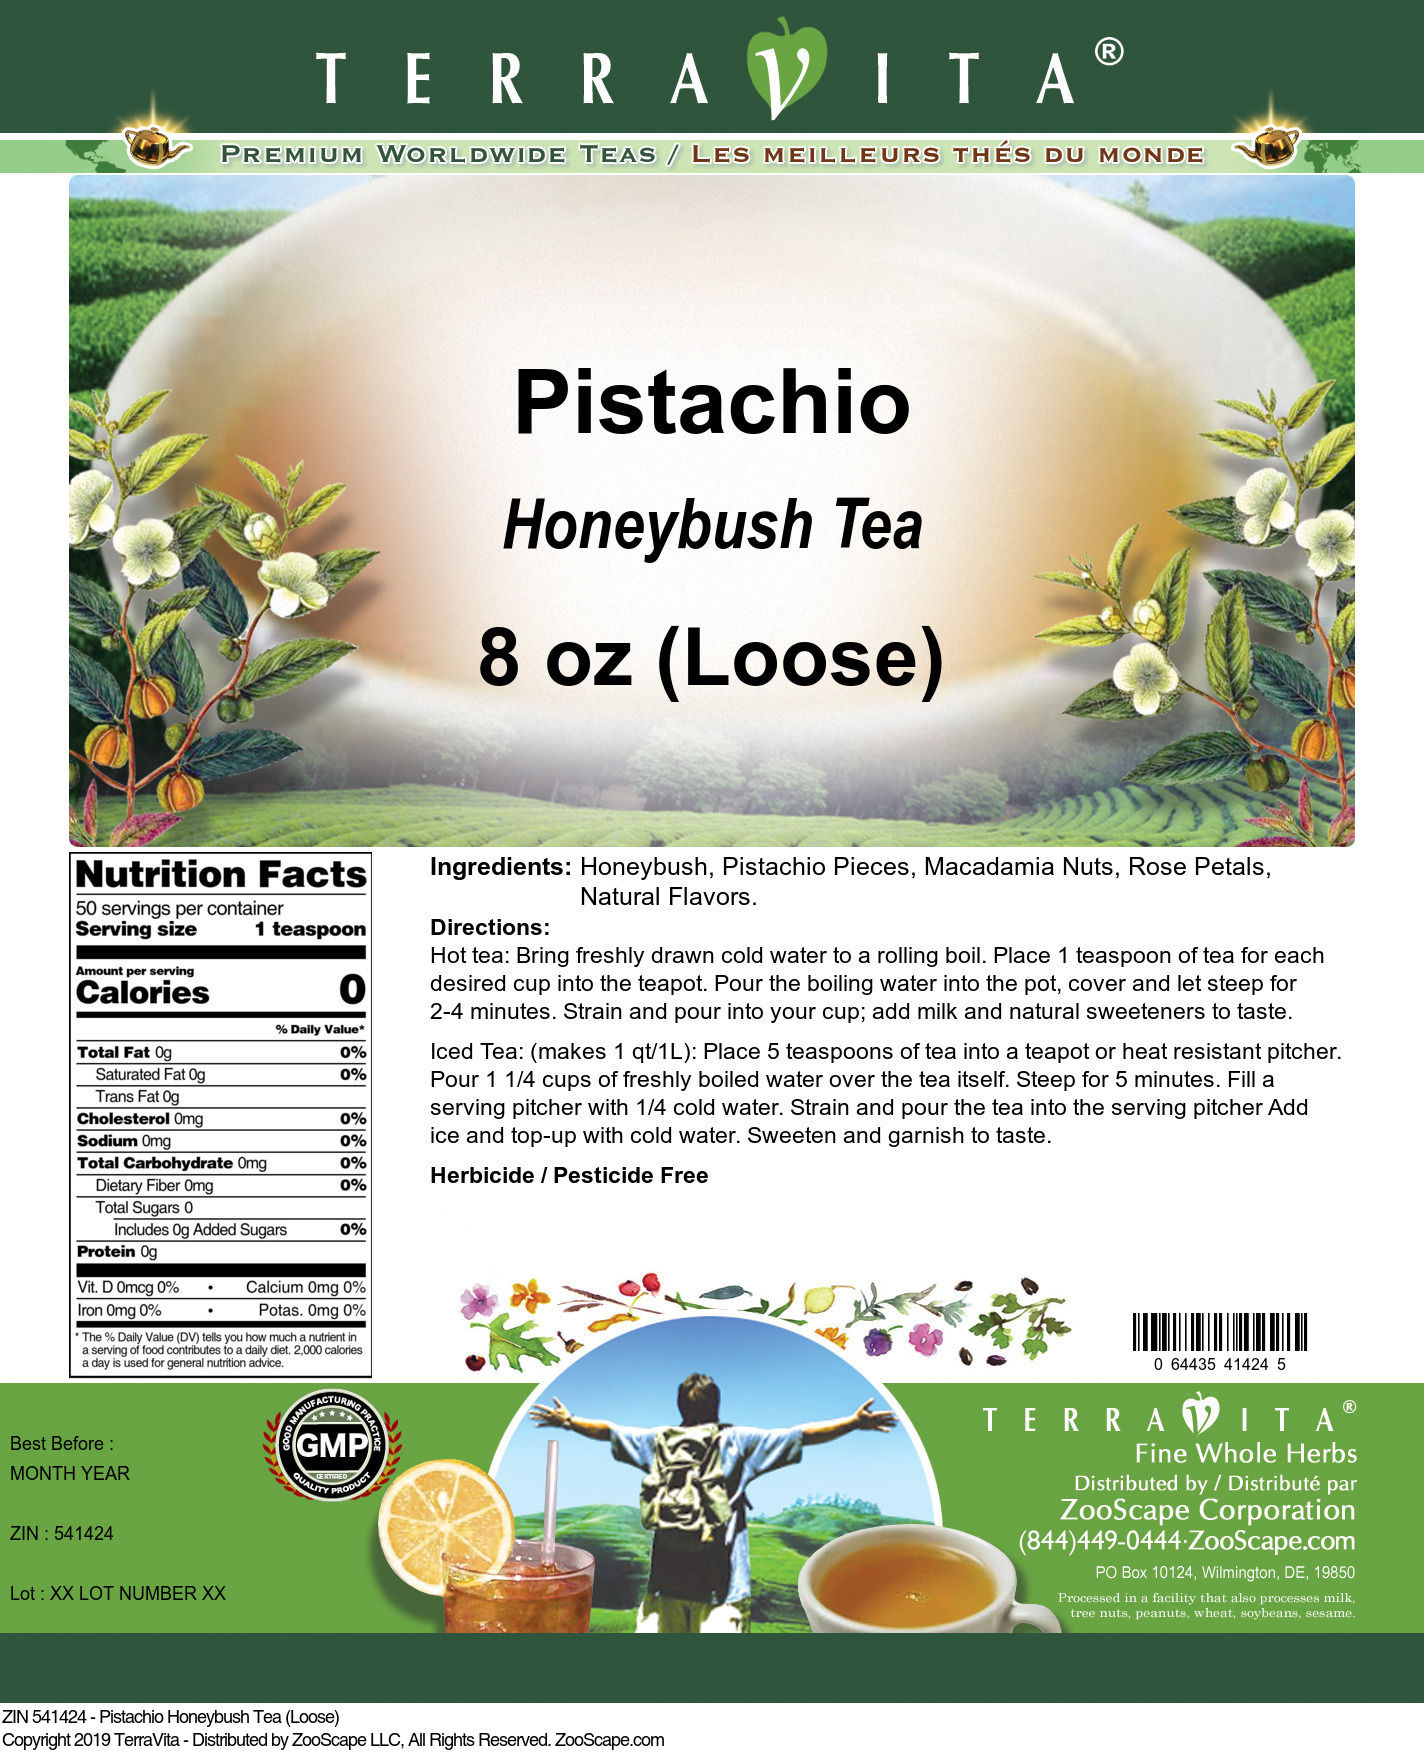 Pistachio Honeybush Tea (Loose)